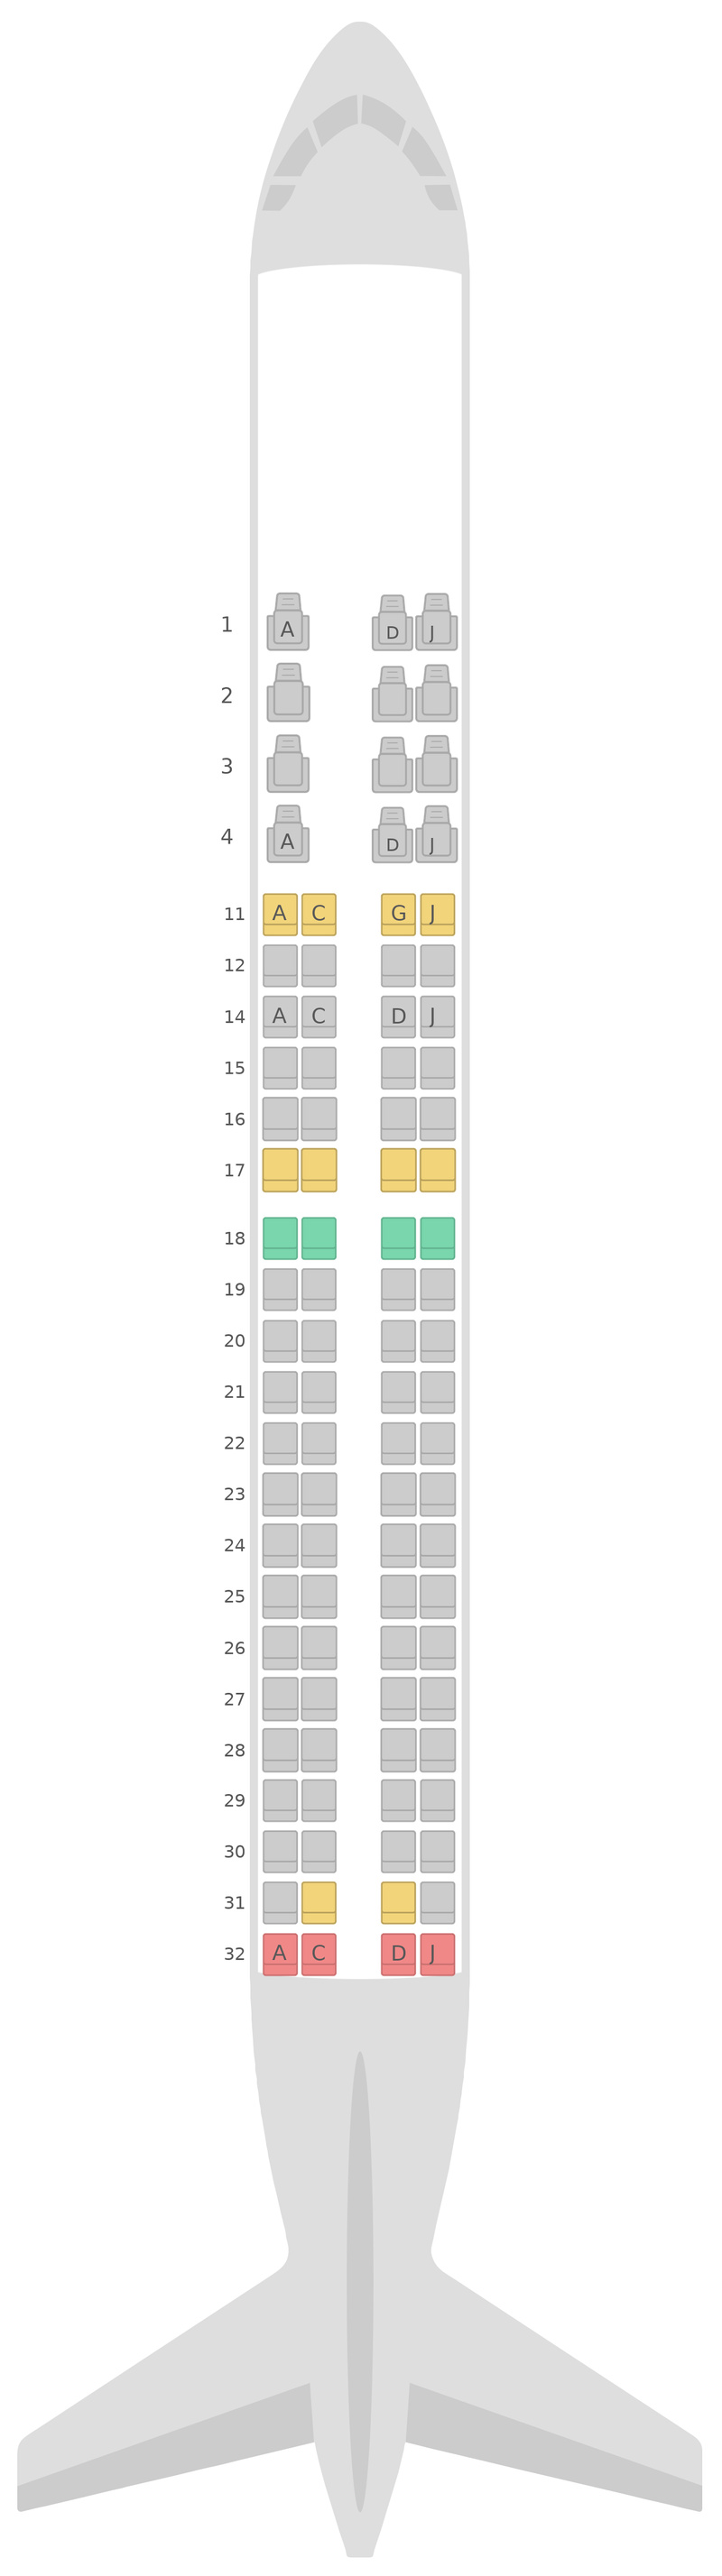 Seat Map Kenya Airways Embraer E190 (E90)